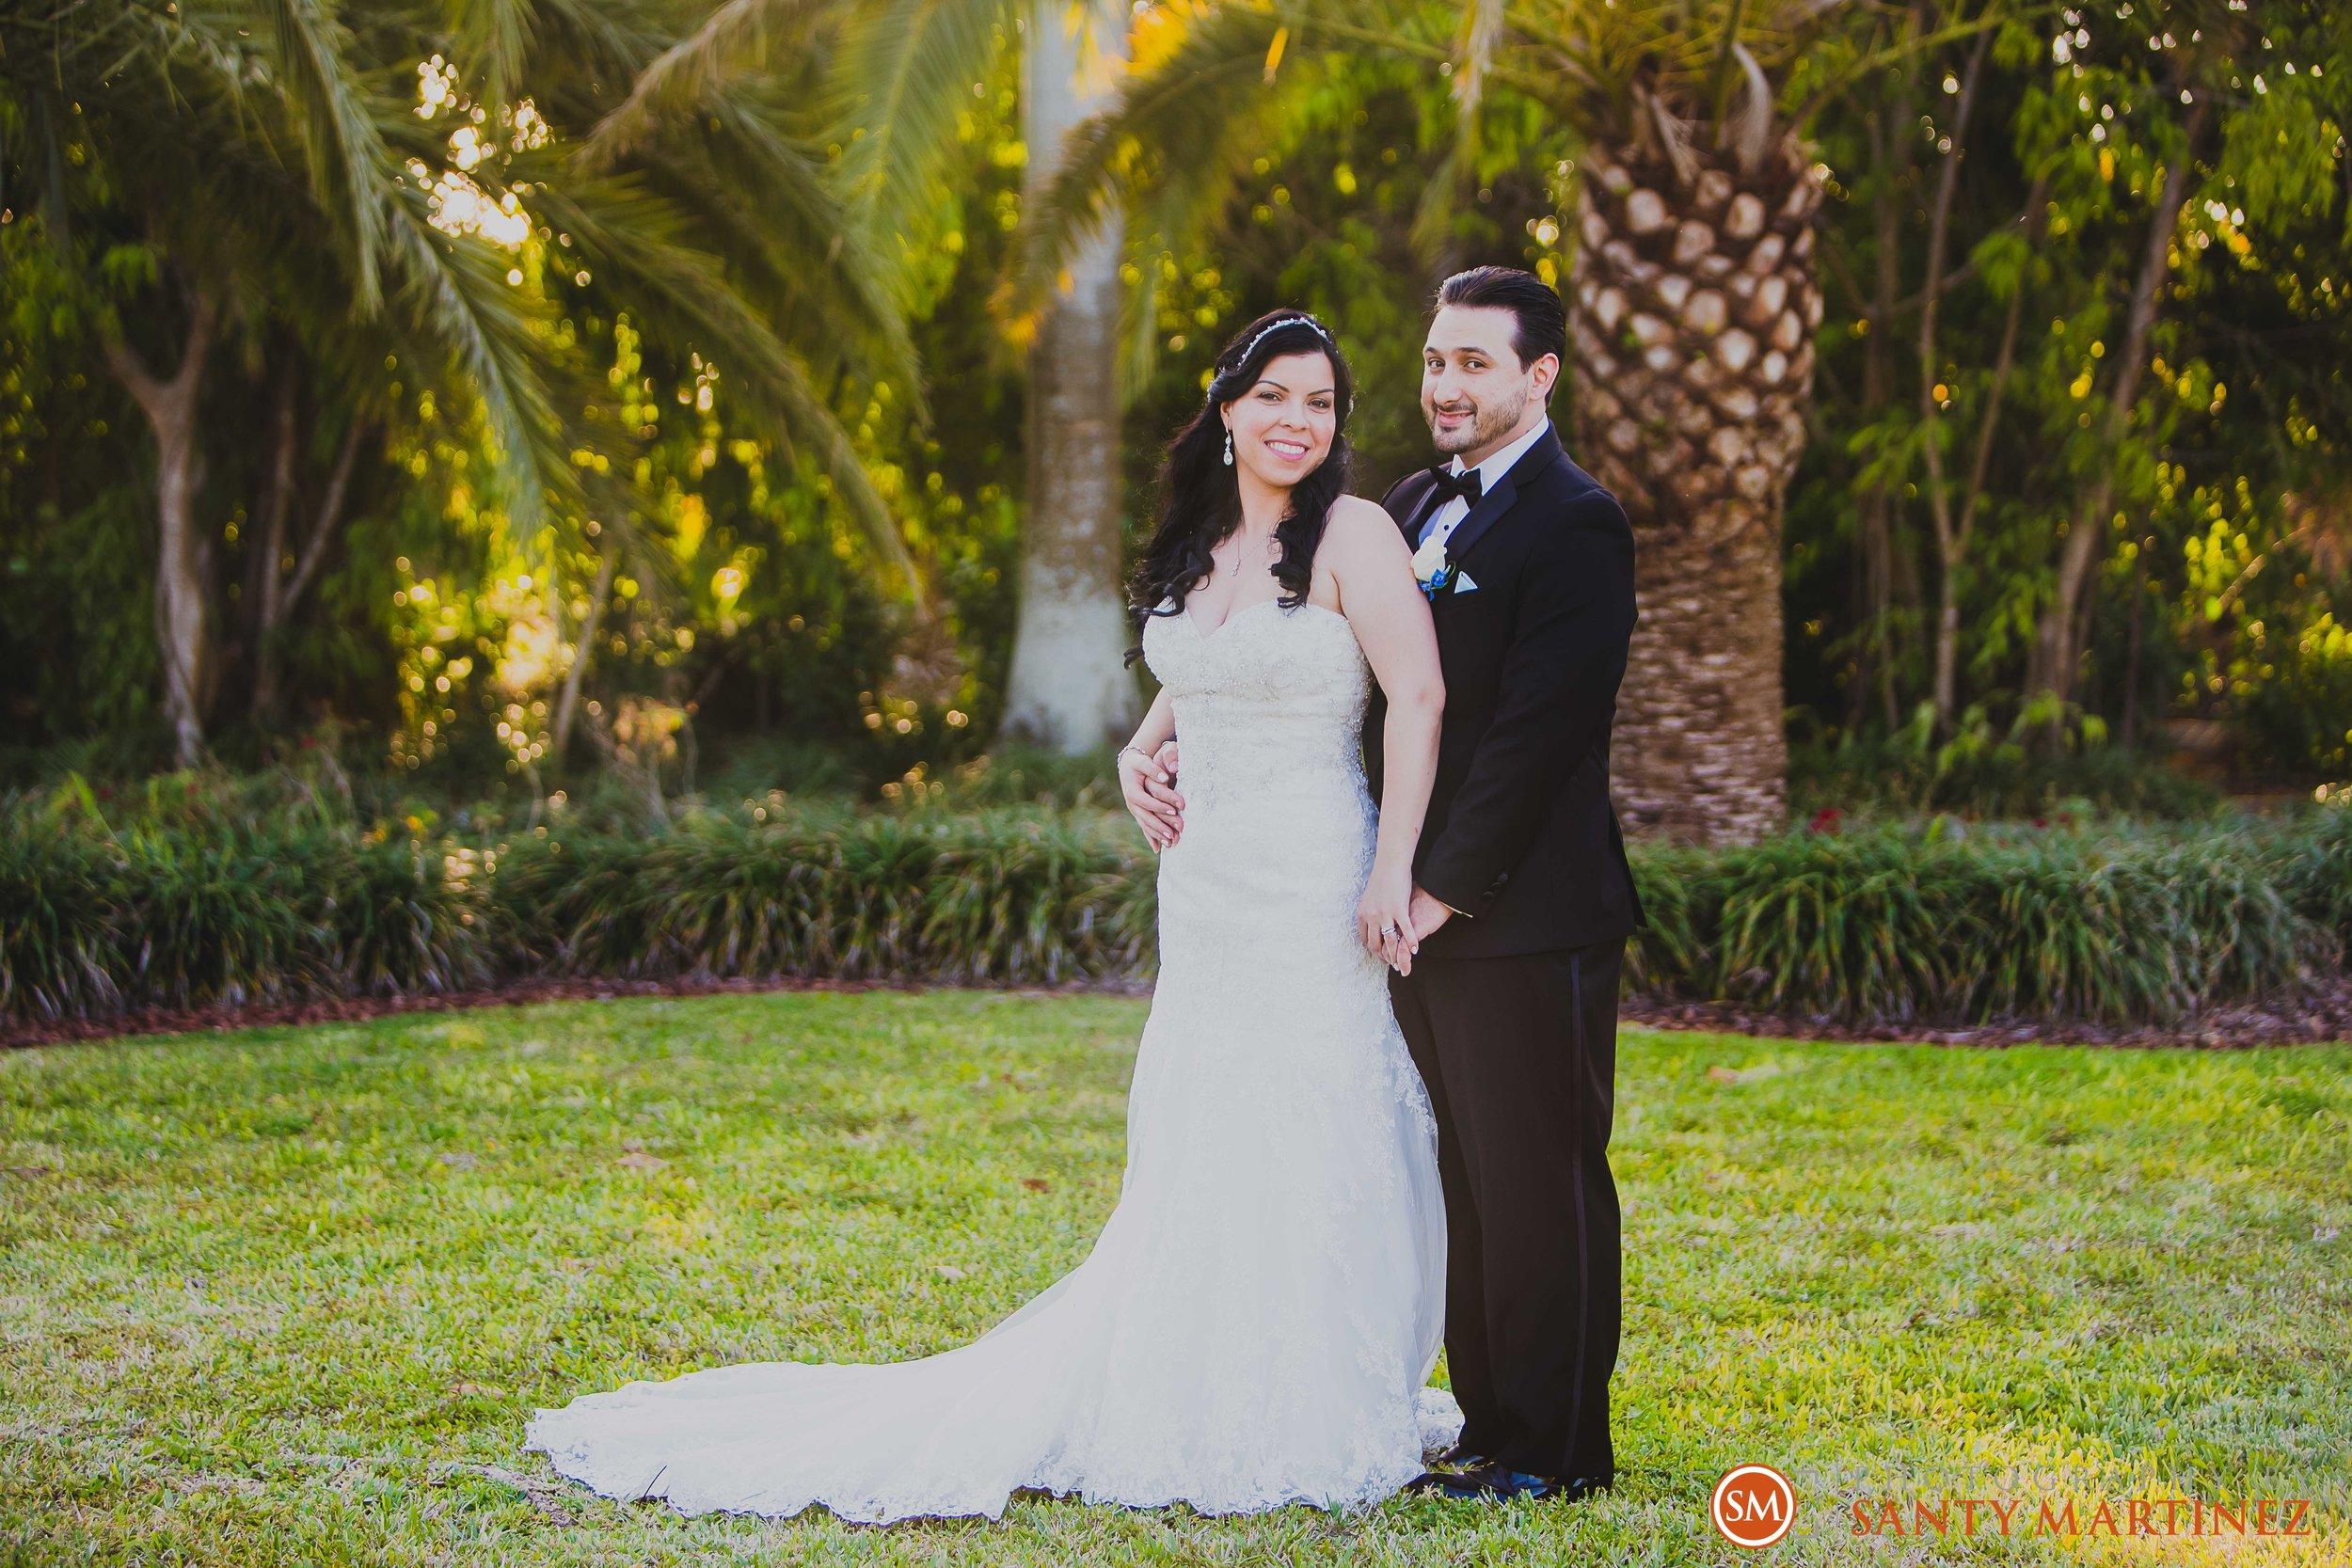 Wedding - Whimsical key West House - Photography by Santy Martinez-29.jpg